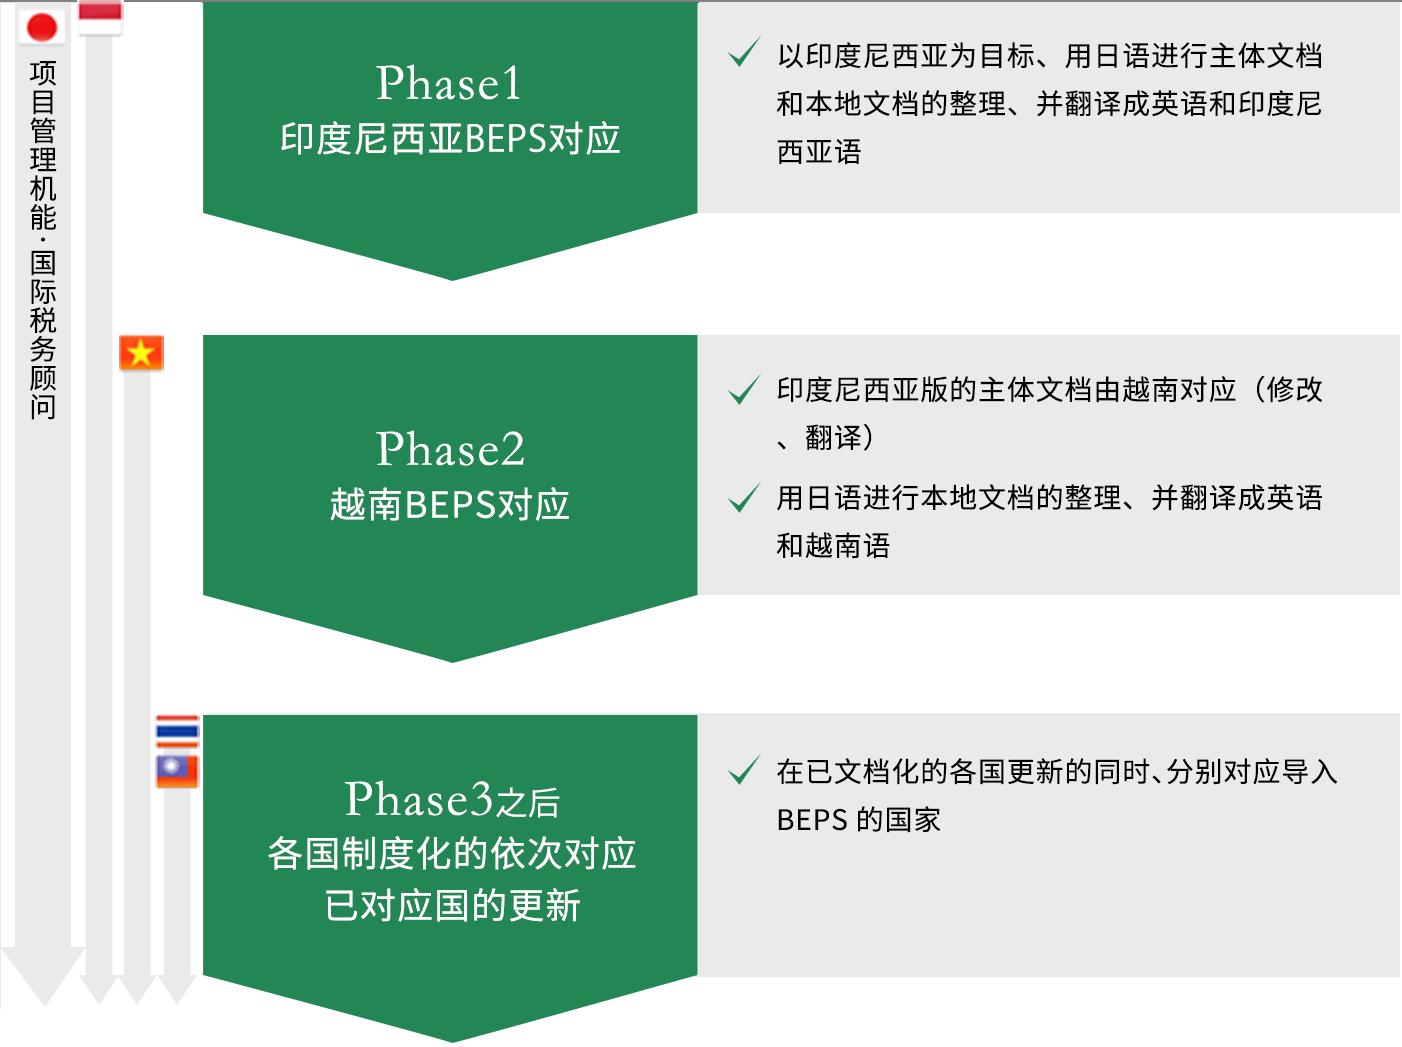 Phase1 :印度尼西亚BEPS对应以印度尼西亚为目标、用日语进行主体文档和本地文档的整理、并翻译成英语和印度尼西亚语 Phase2 :越南BEPS对应印度尼西亚版的主体文档由越南对应(修改、翻译)用日语进行本地文档的整理、并翻译成英语和越南语 Phase3之后: 各国制度化的依次对应已对应国的更新在已文档化的各国更新的同时、分别对应导入BEPS的国家